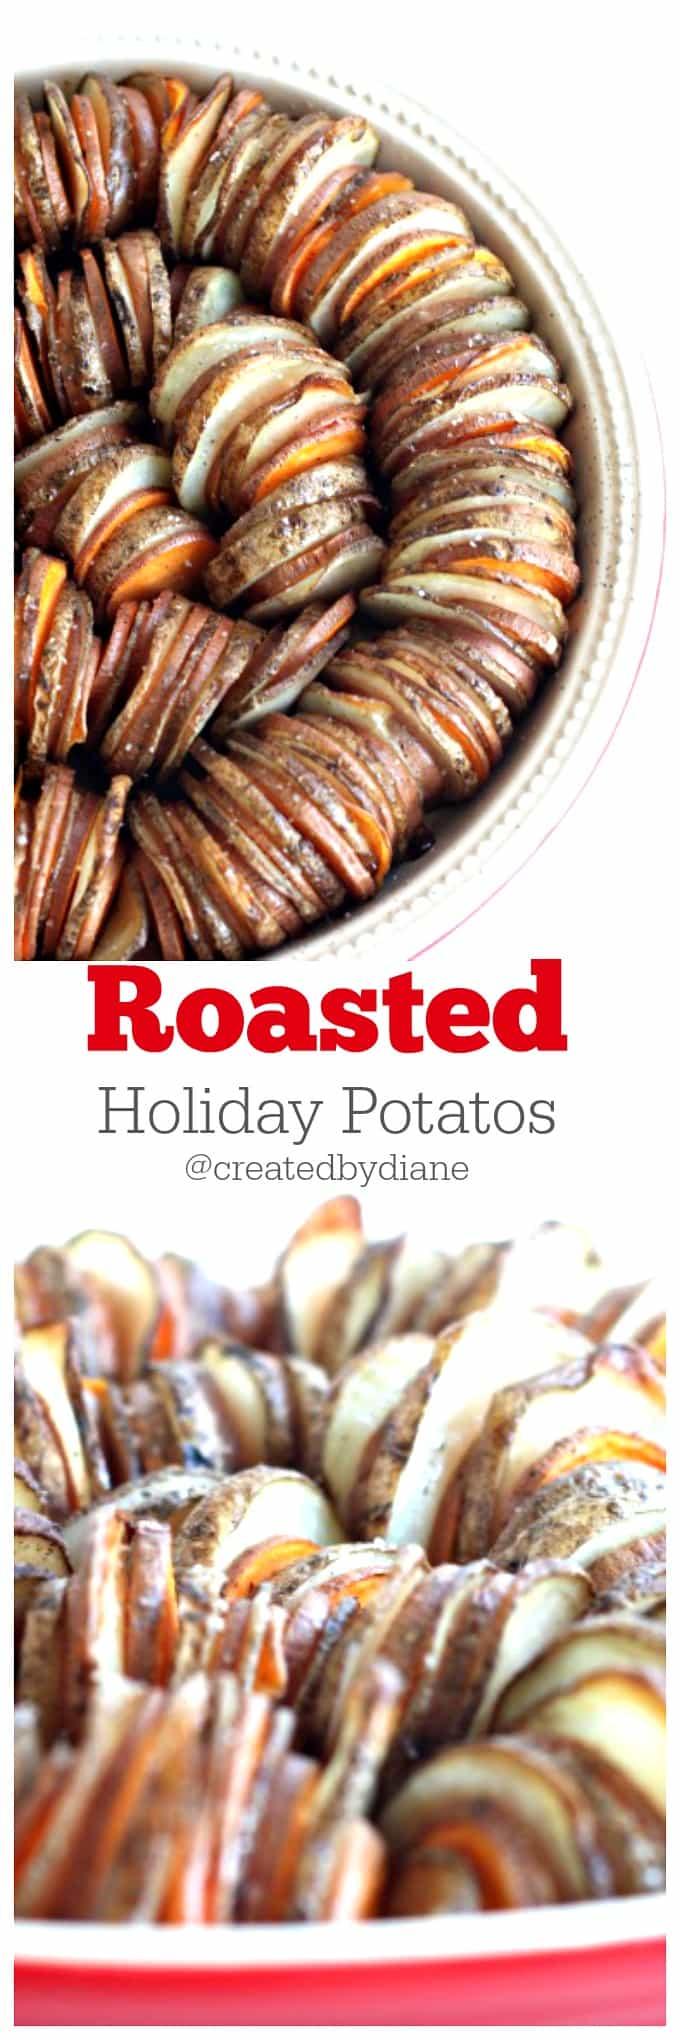 Roasted Holiday Potatoes www.createdby-diane.com @createdbydiane